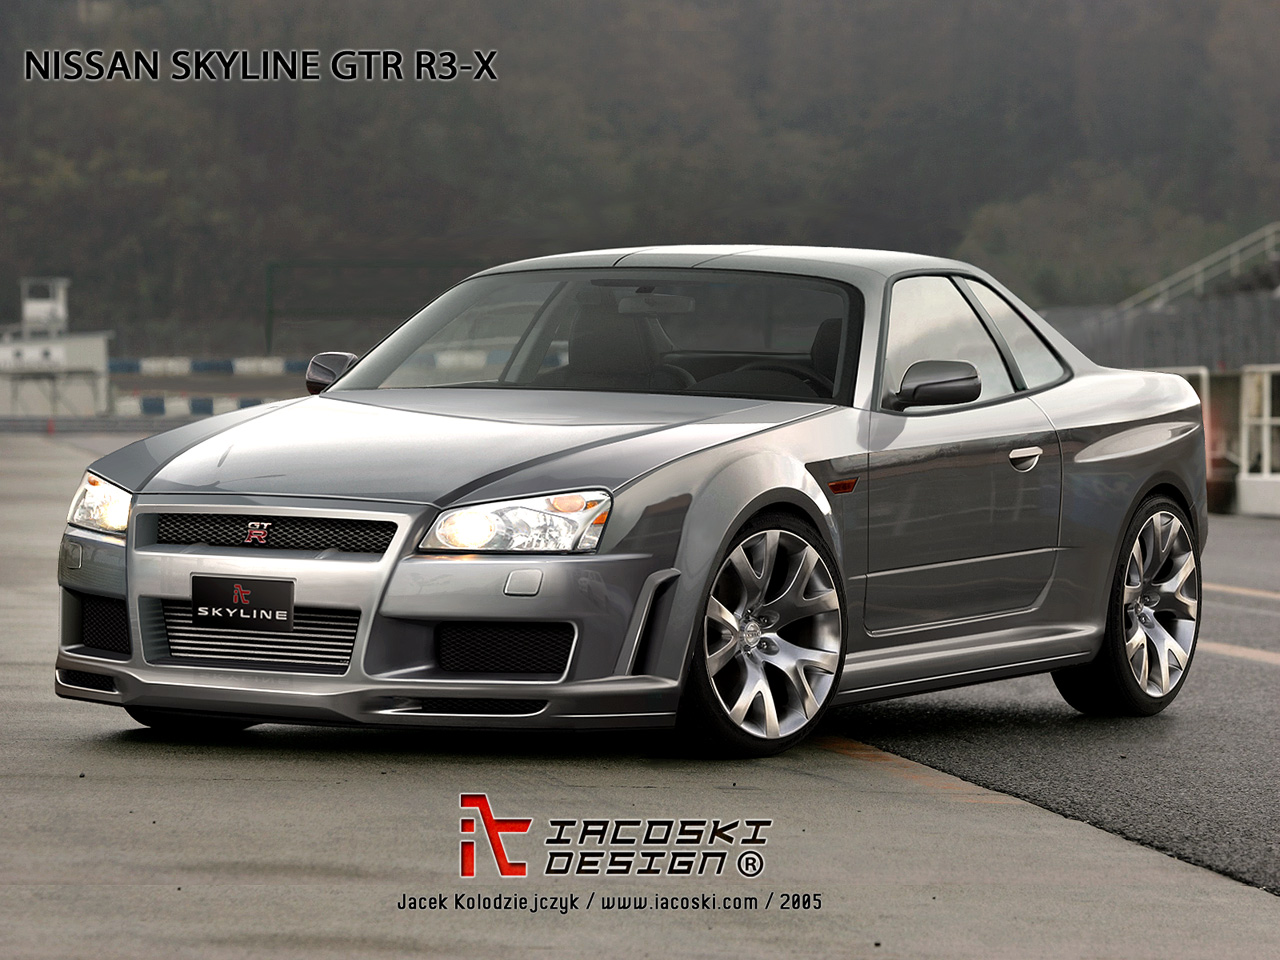 Nissan Skyline R3X Concept by iacoski